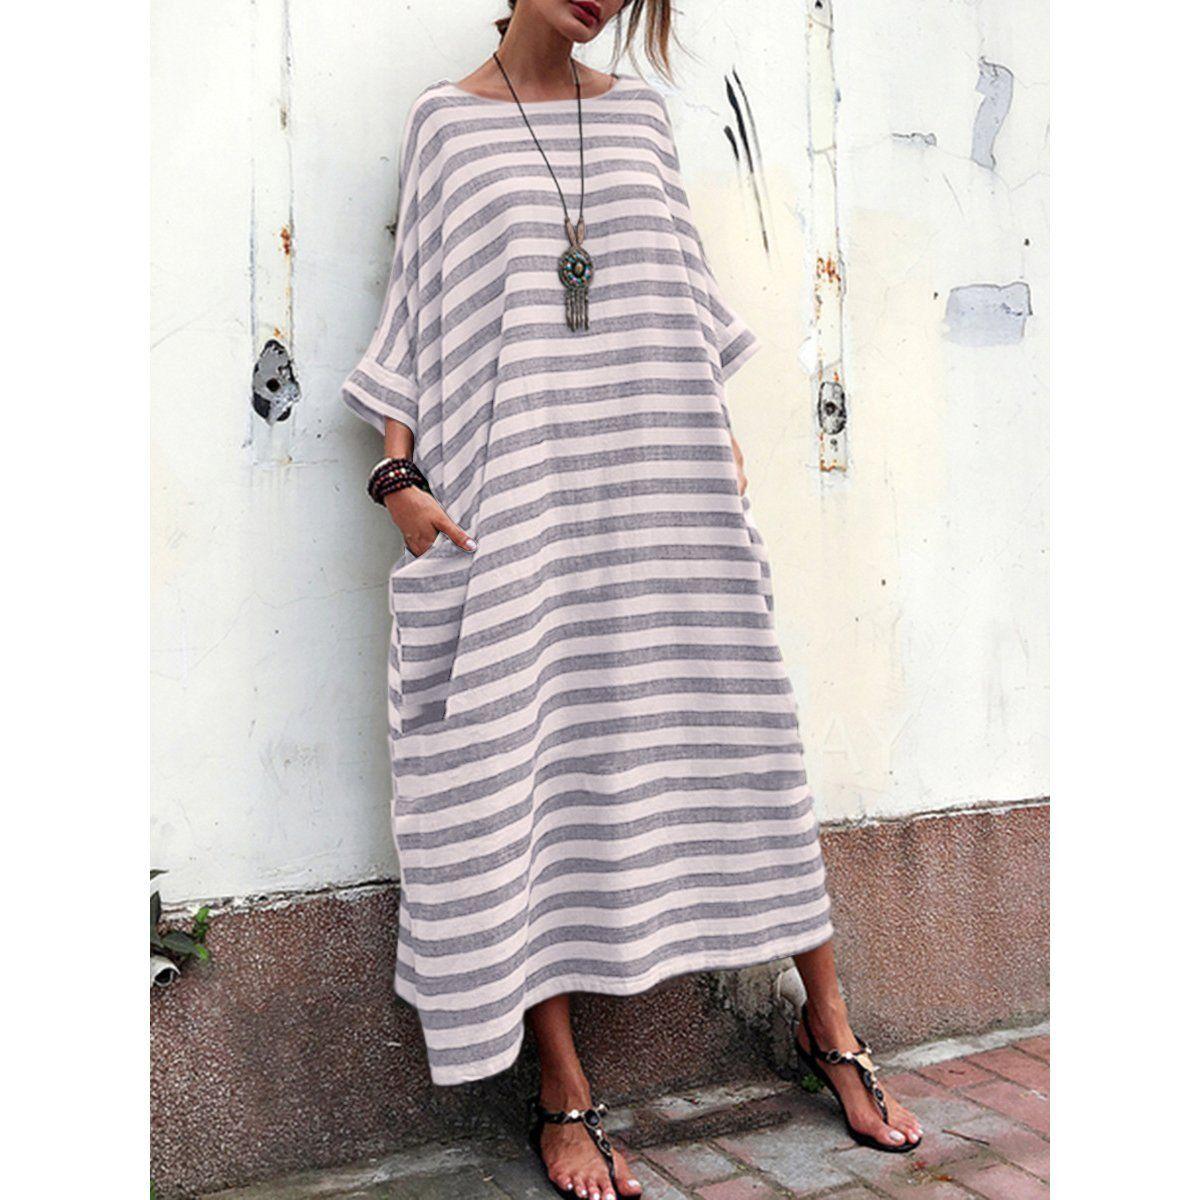 Cocoon Women Daily Casual 3 4 Sleeve Pockets Striped Summer Dress Pocket Maxi Dress Loose Maxi Dress Maxi Shift Dress [ 1200 x 1200 Pixel ]